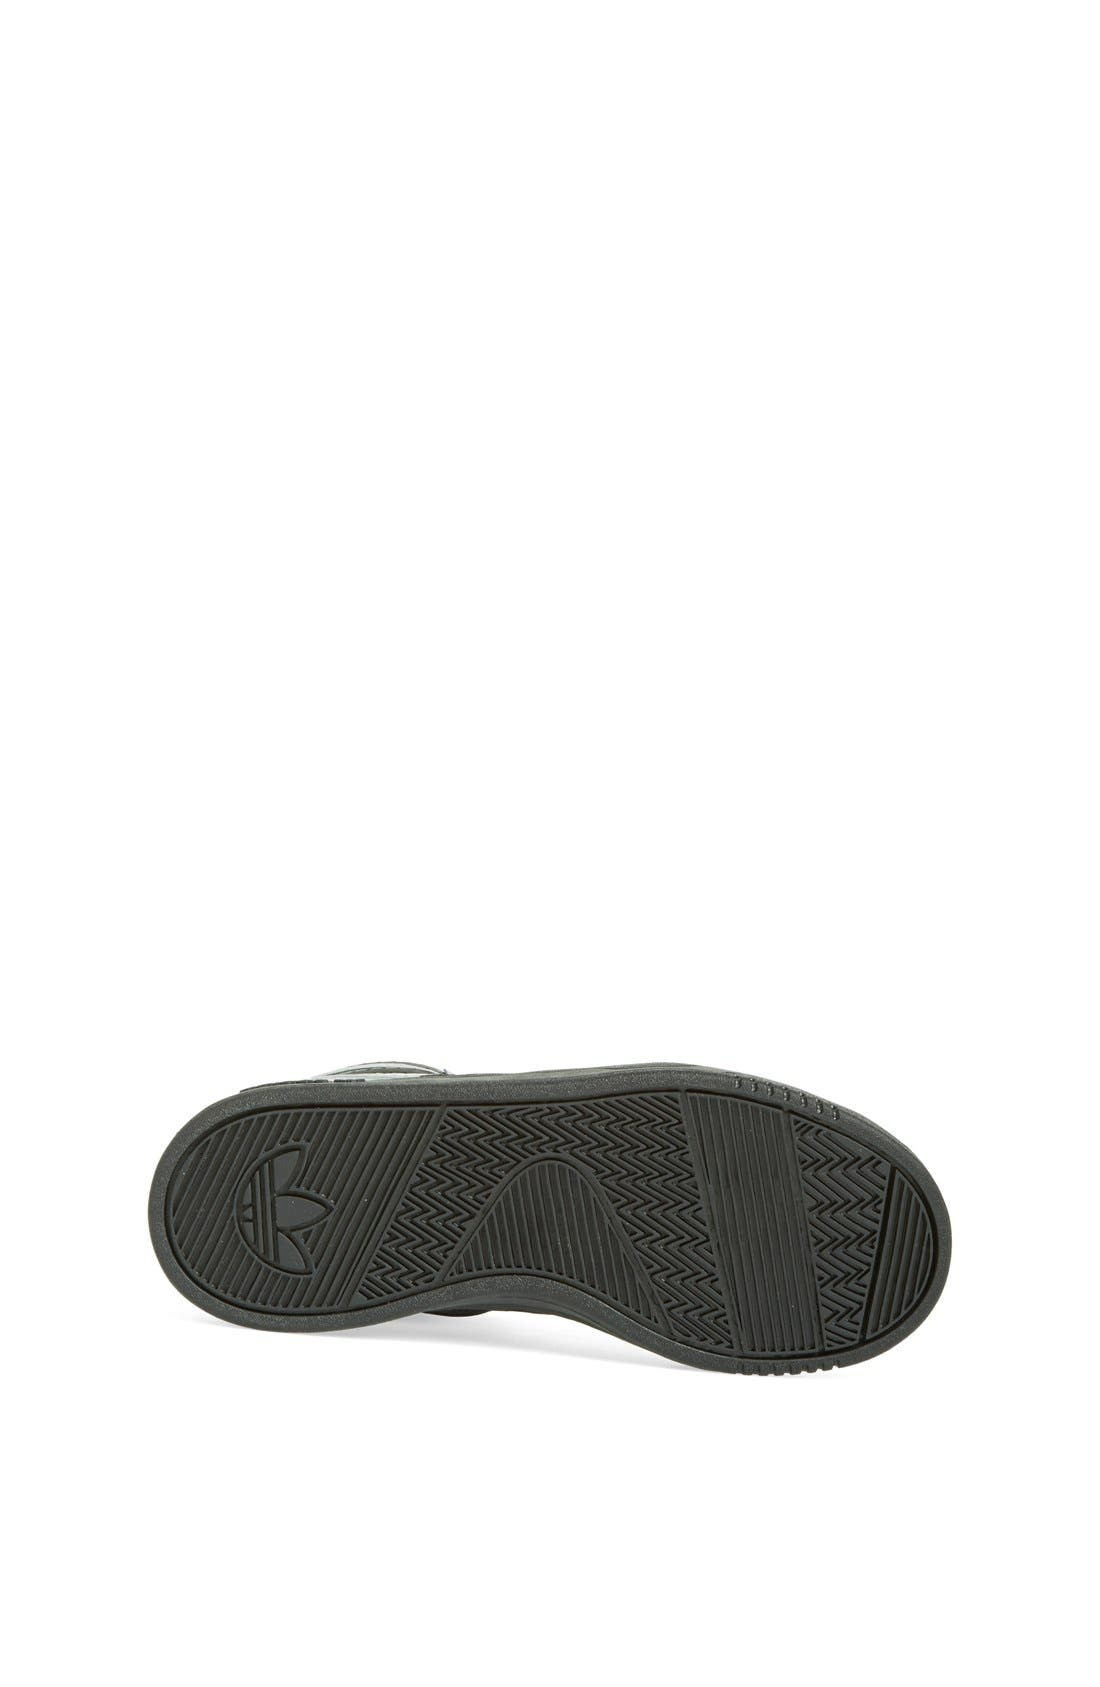 Alternate Image 4  - adidas 'Court Attitude' Sneaker (Toddler, Little Kid & Big Kid)